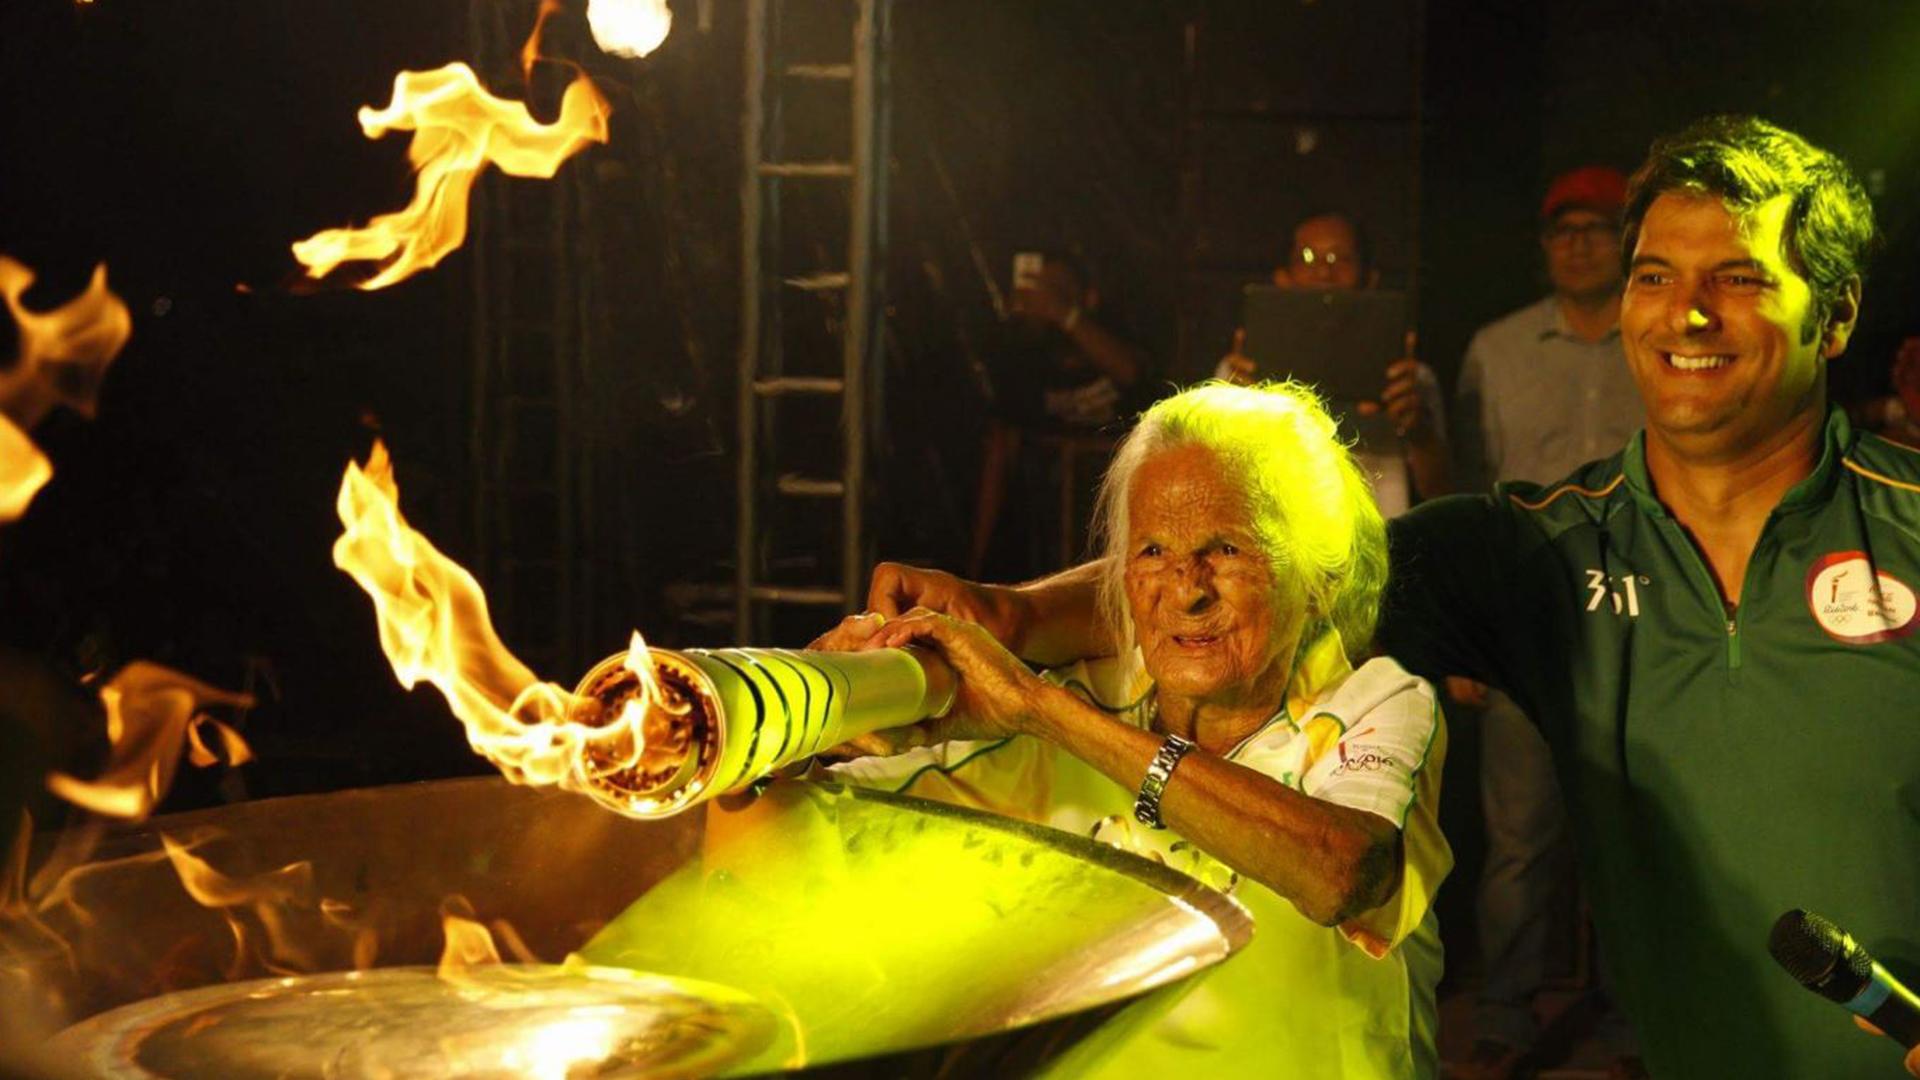 106-year-old torchbearer lights Olympic cauldron in Brazil ...